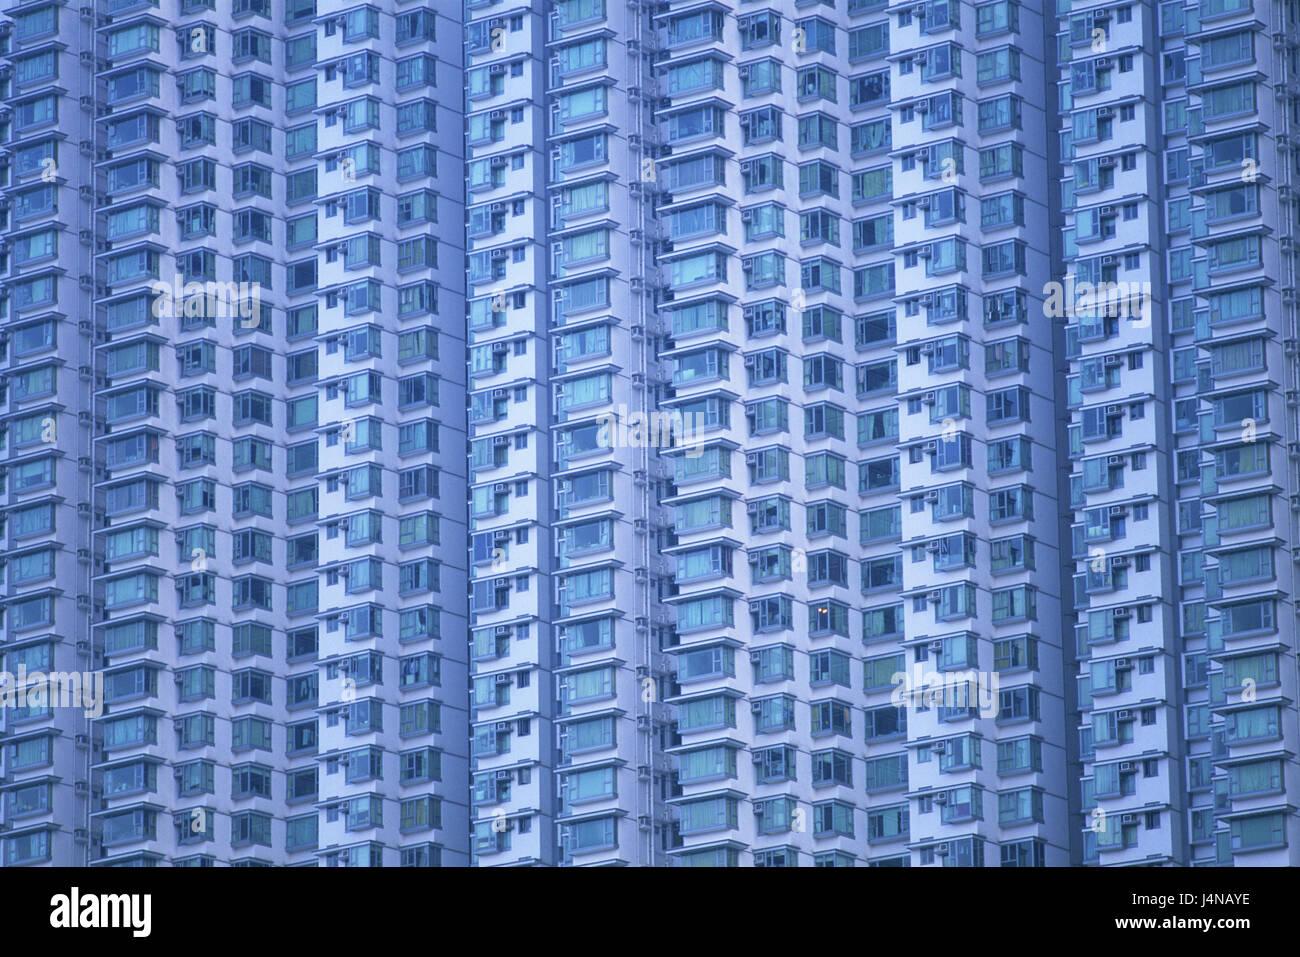 China, Hong Kong, Lantau Iceland, Tung Chung, high rise, facade, detail, Asia, town, island, building, house, residential - Stock Image